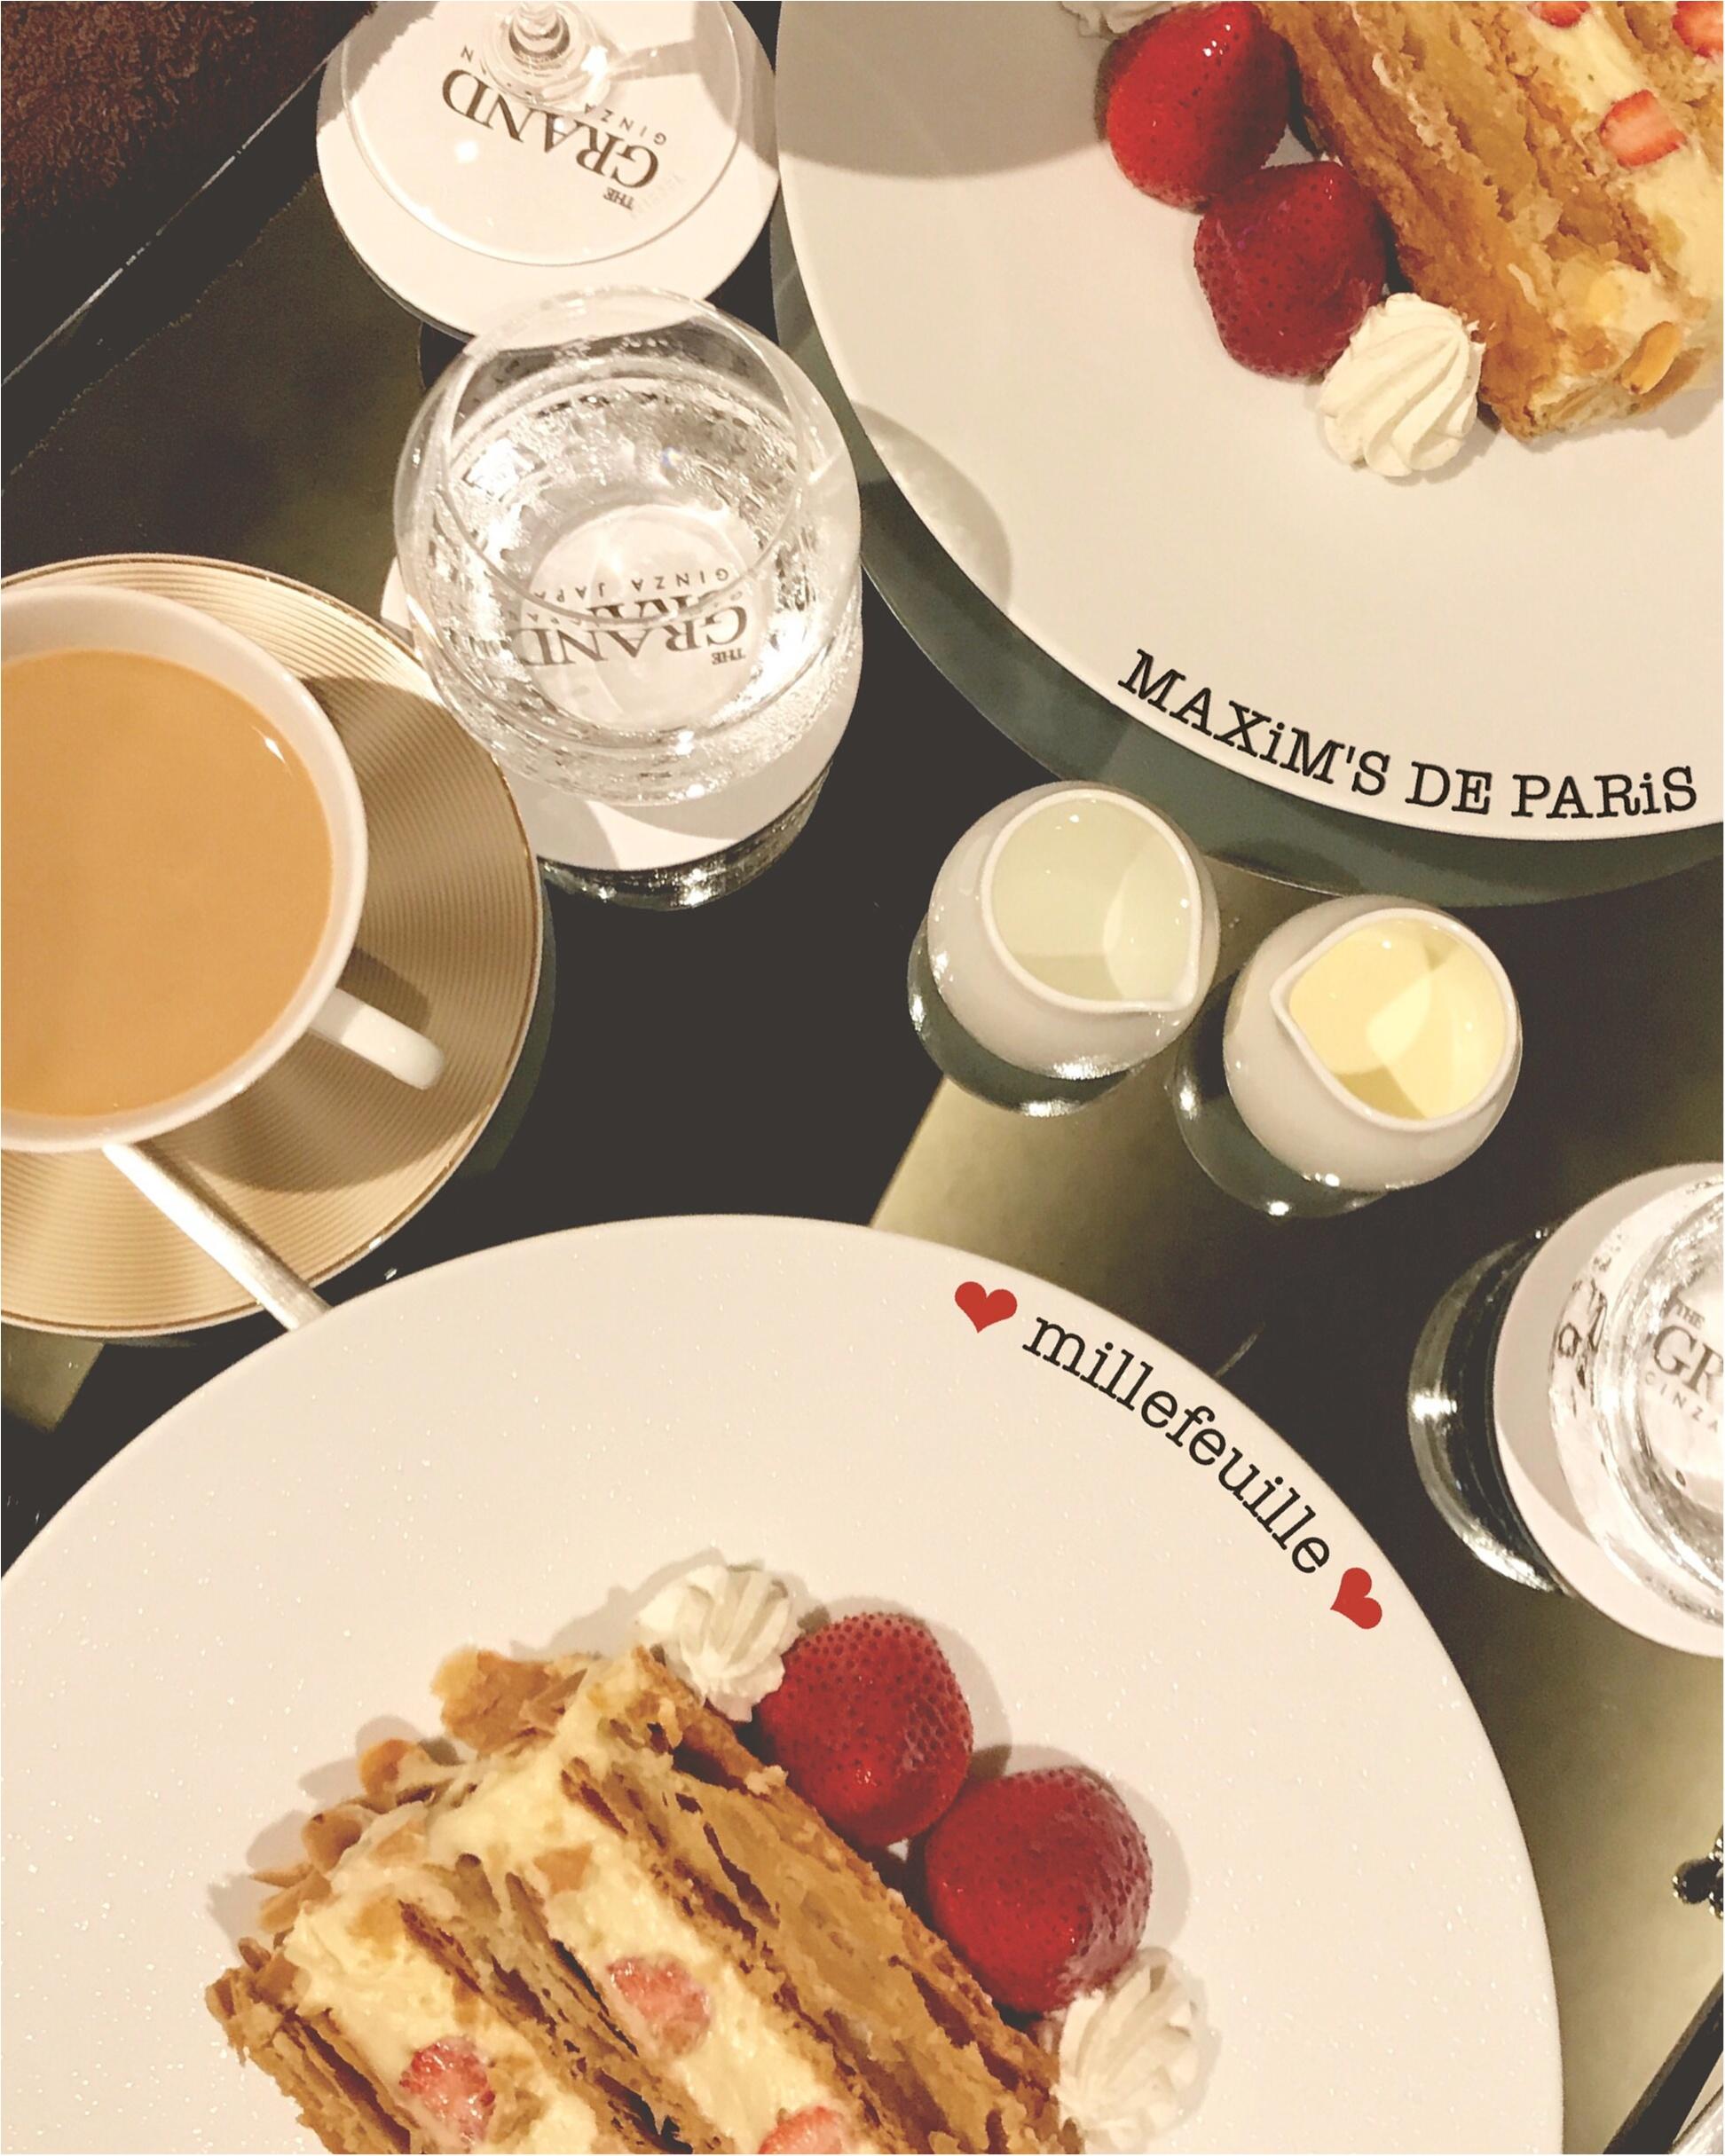 【SWEET】伝説の、マキシム・ド・パリのミルフィーユが銀座で復活!当時と変わった?味わいはいかに♡_3